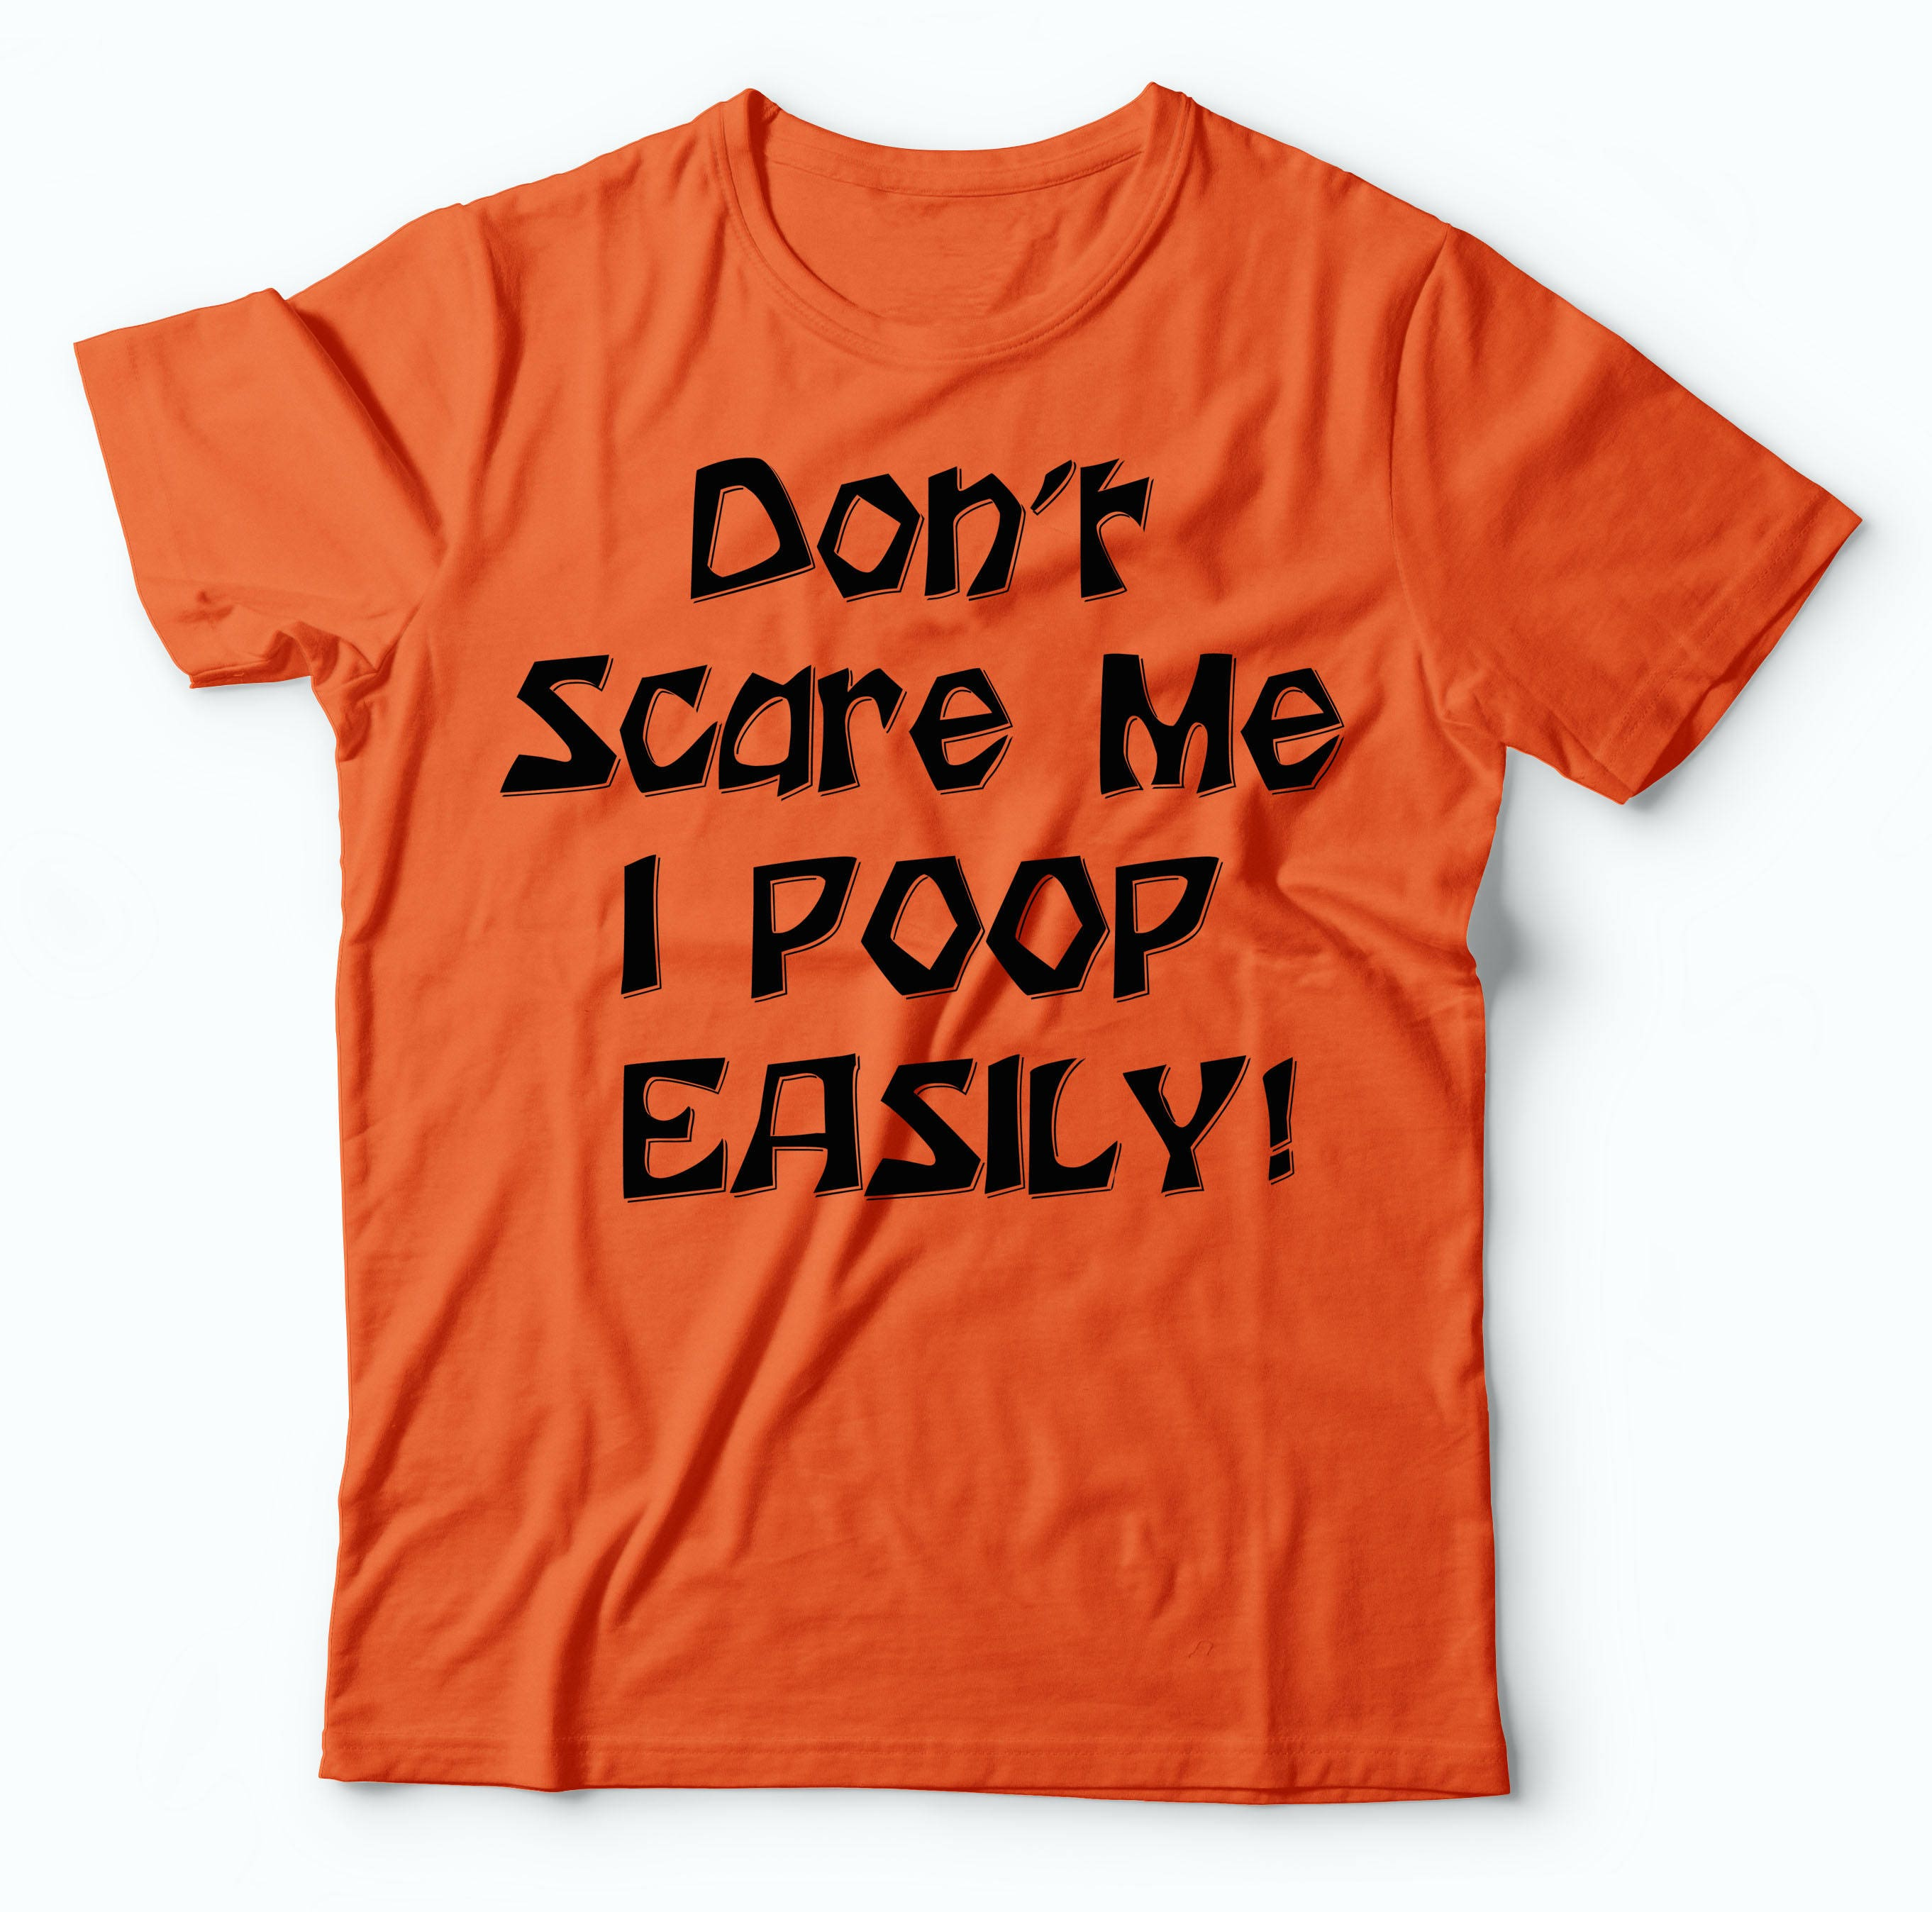 d9033f242 Halloween Orange T-Shirt Funny Halloween Costume Party Tee | Etsy